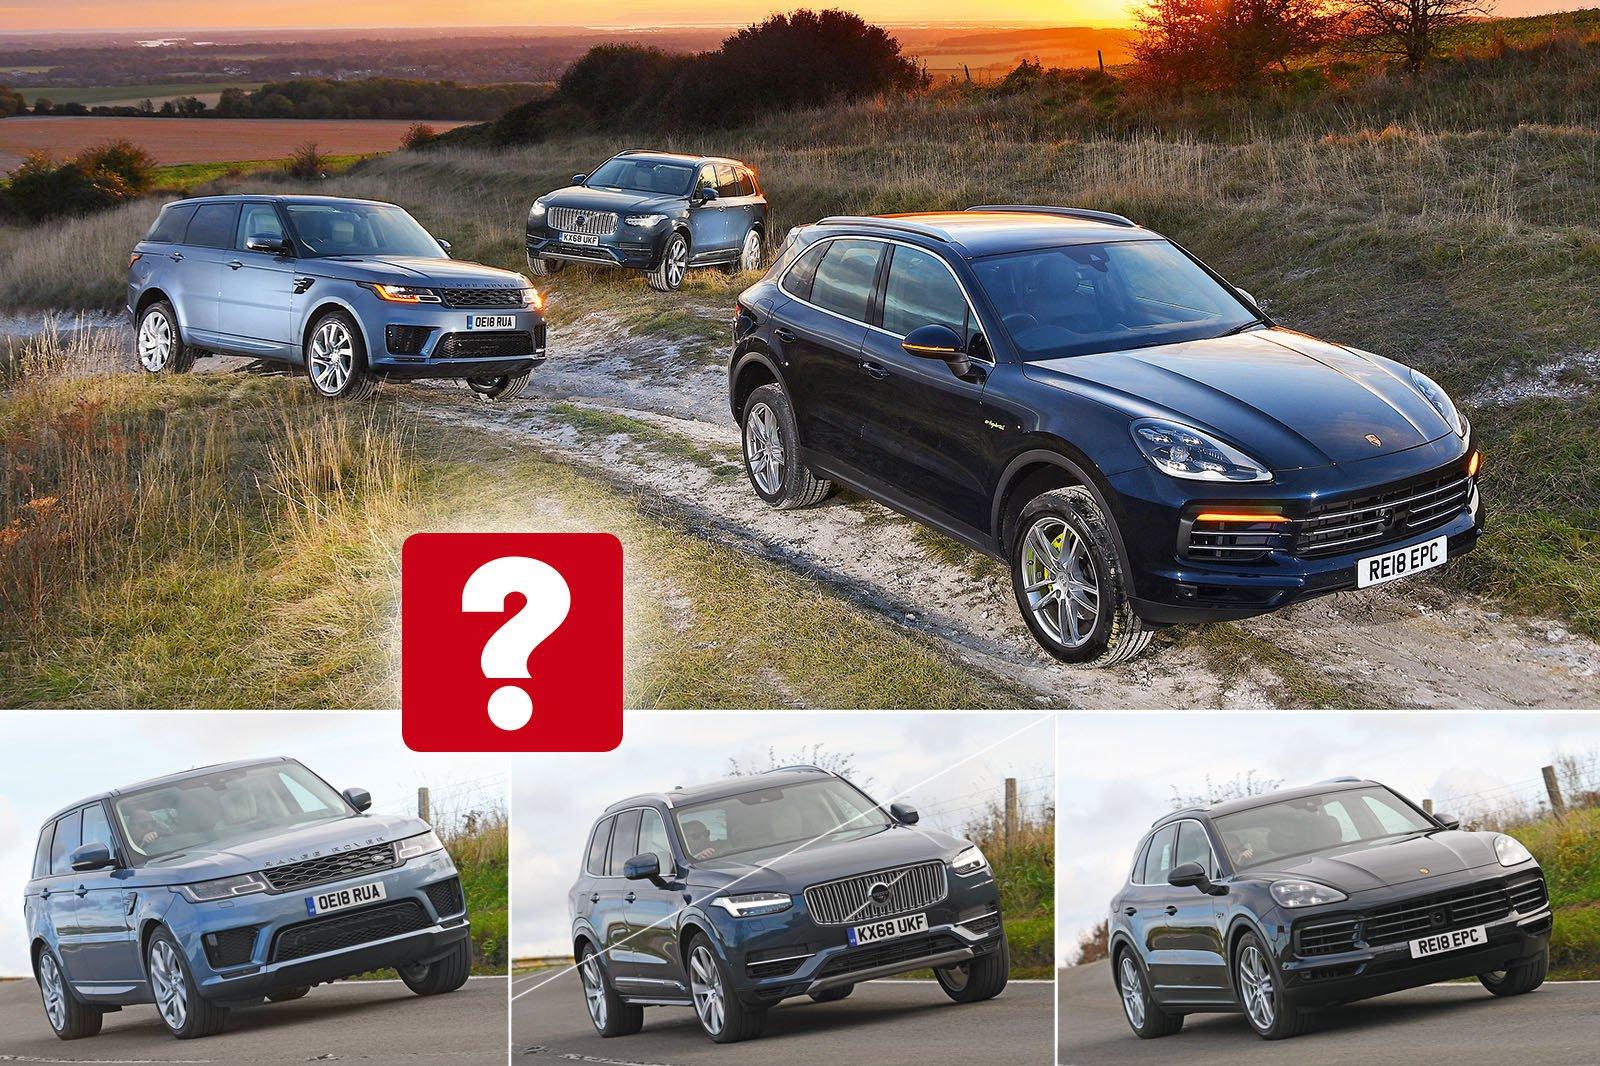 New Porsche Cayenne Range Rover Sport Vs Volvo Xc90 Hybrids